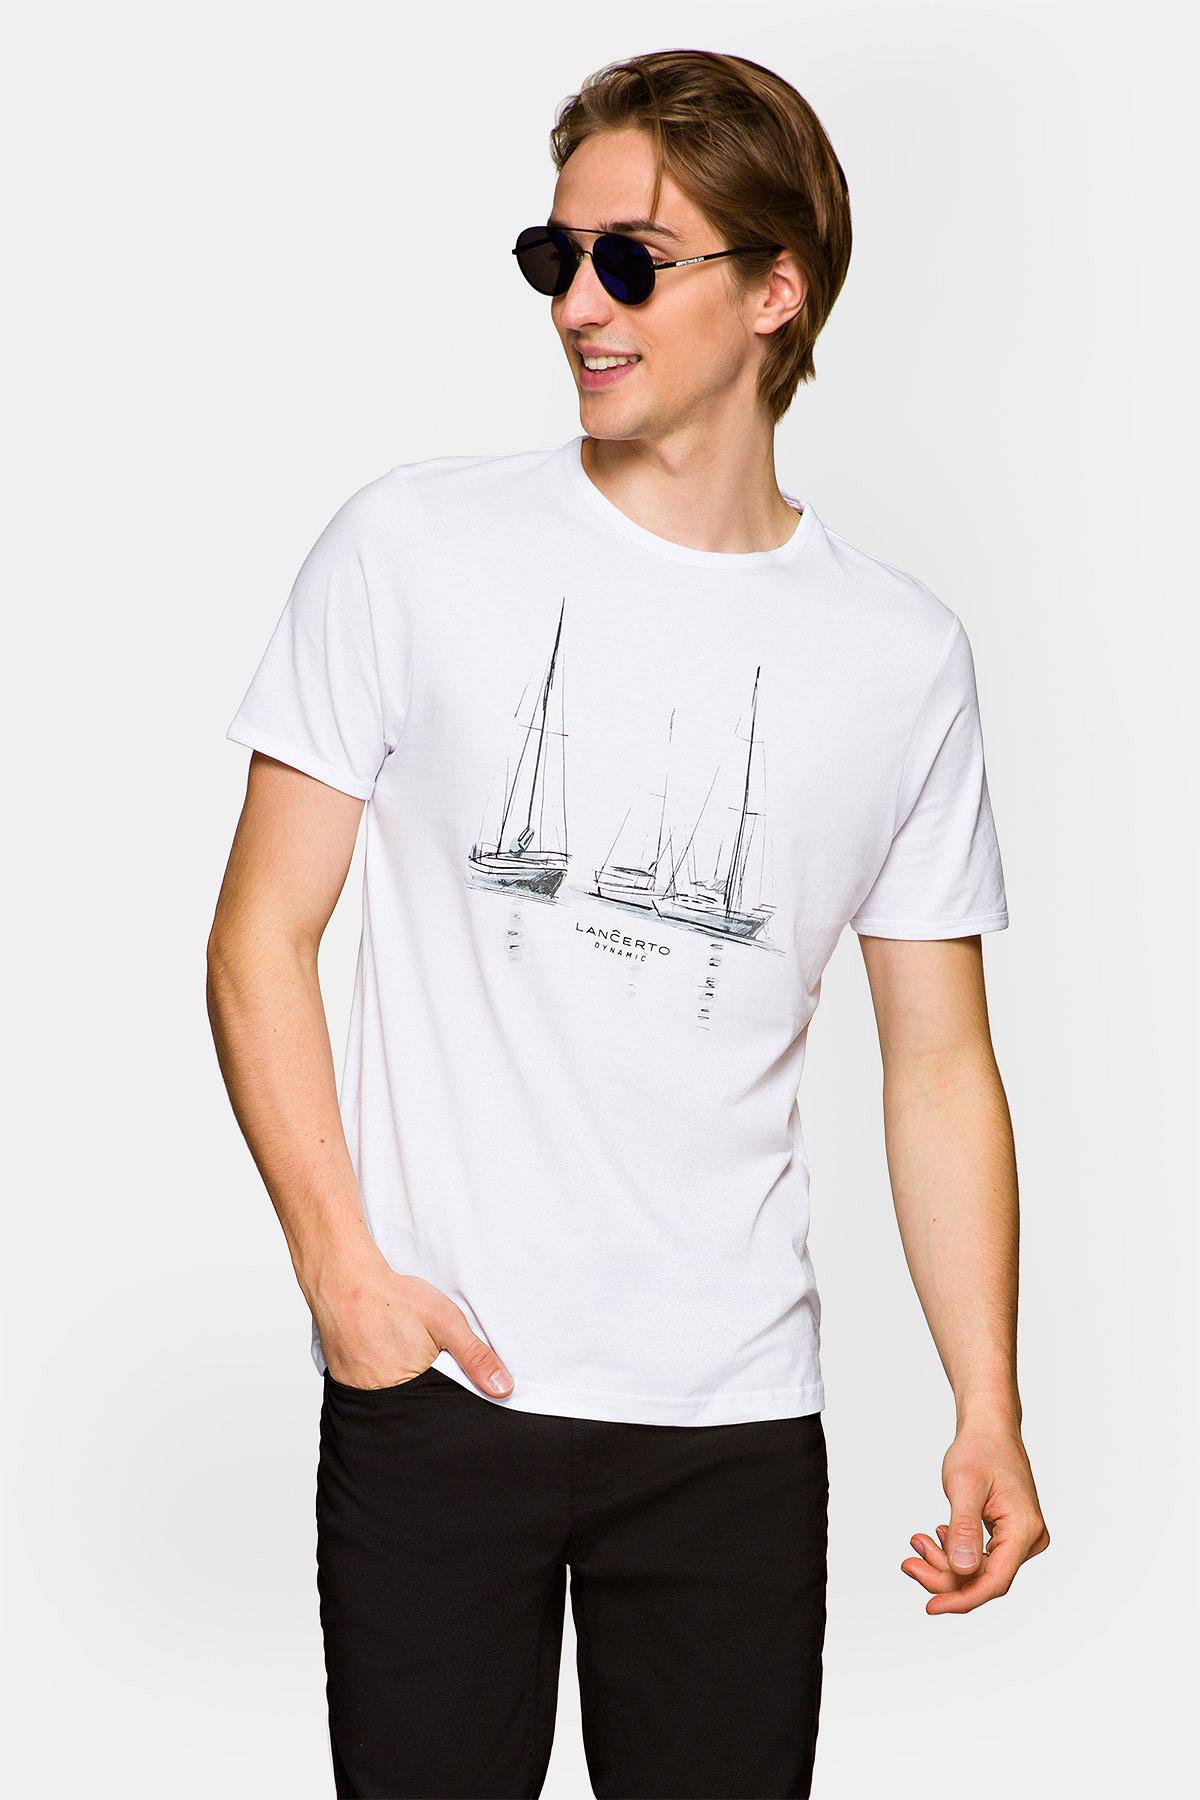 Koszulka Biała Charlie rozmiar 2XL; 3XL; L; M; XL